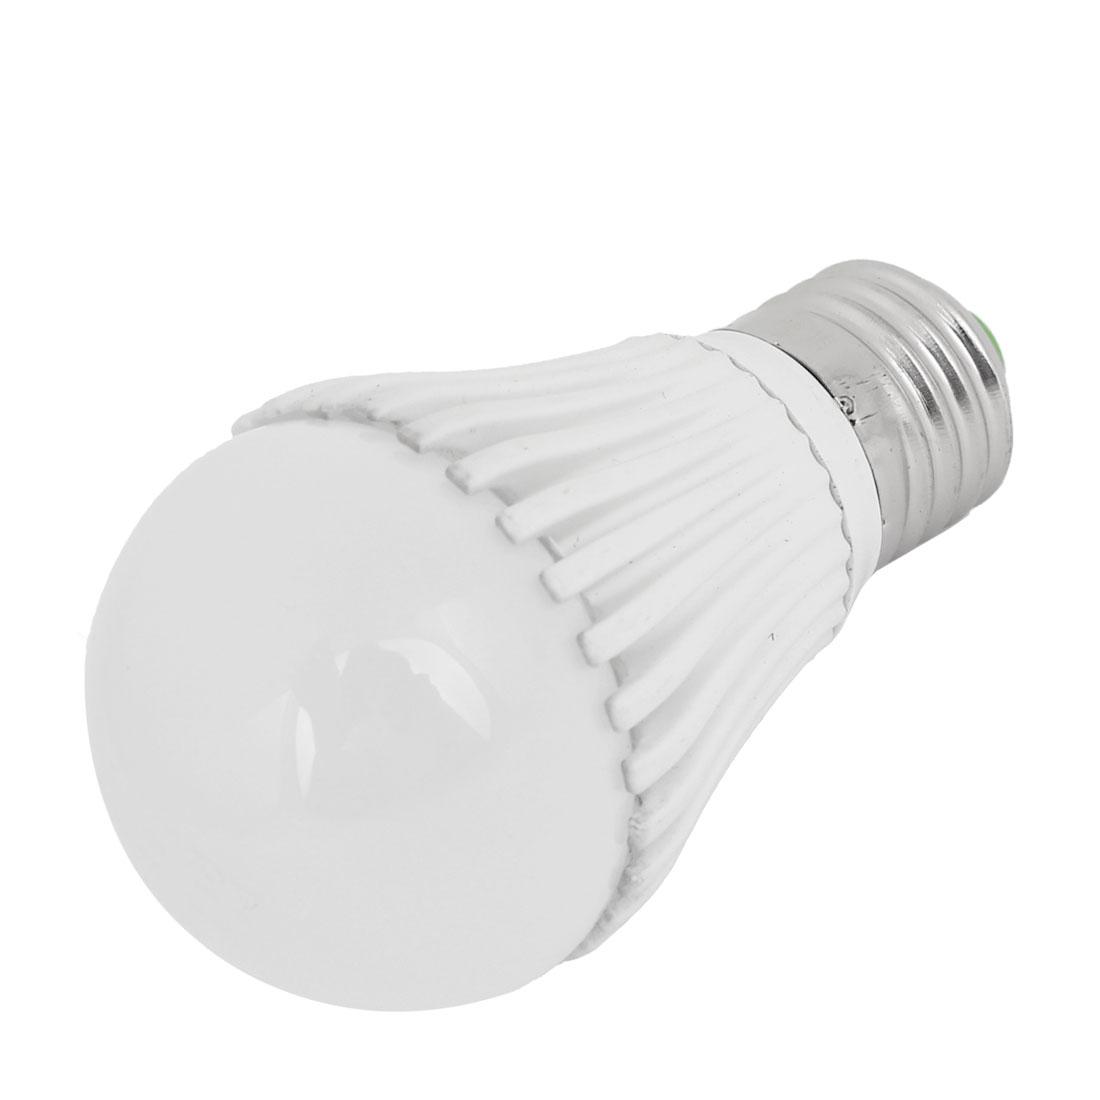 Home Bathroom Energy Saving E27 Screw Base 5W 10 SMD LEDs Lamp Light Bulb Yellow